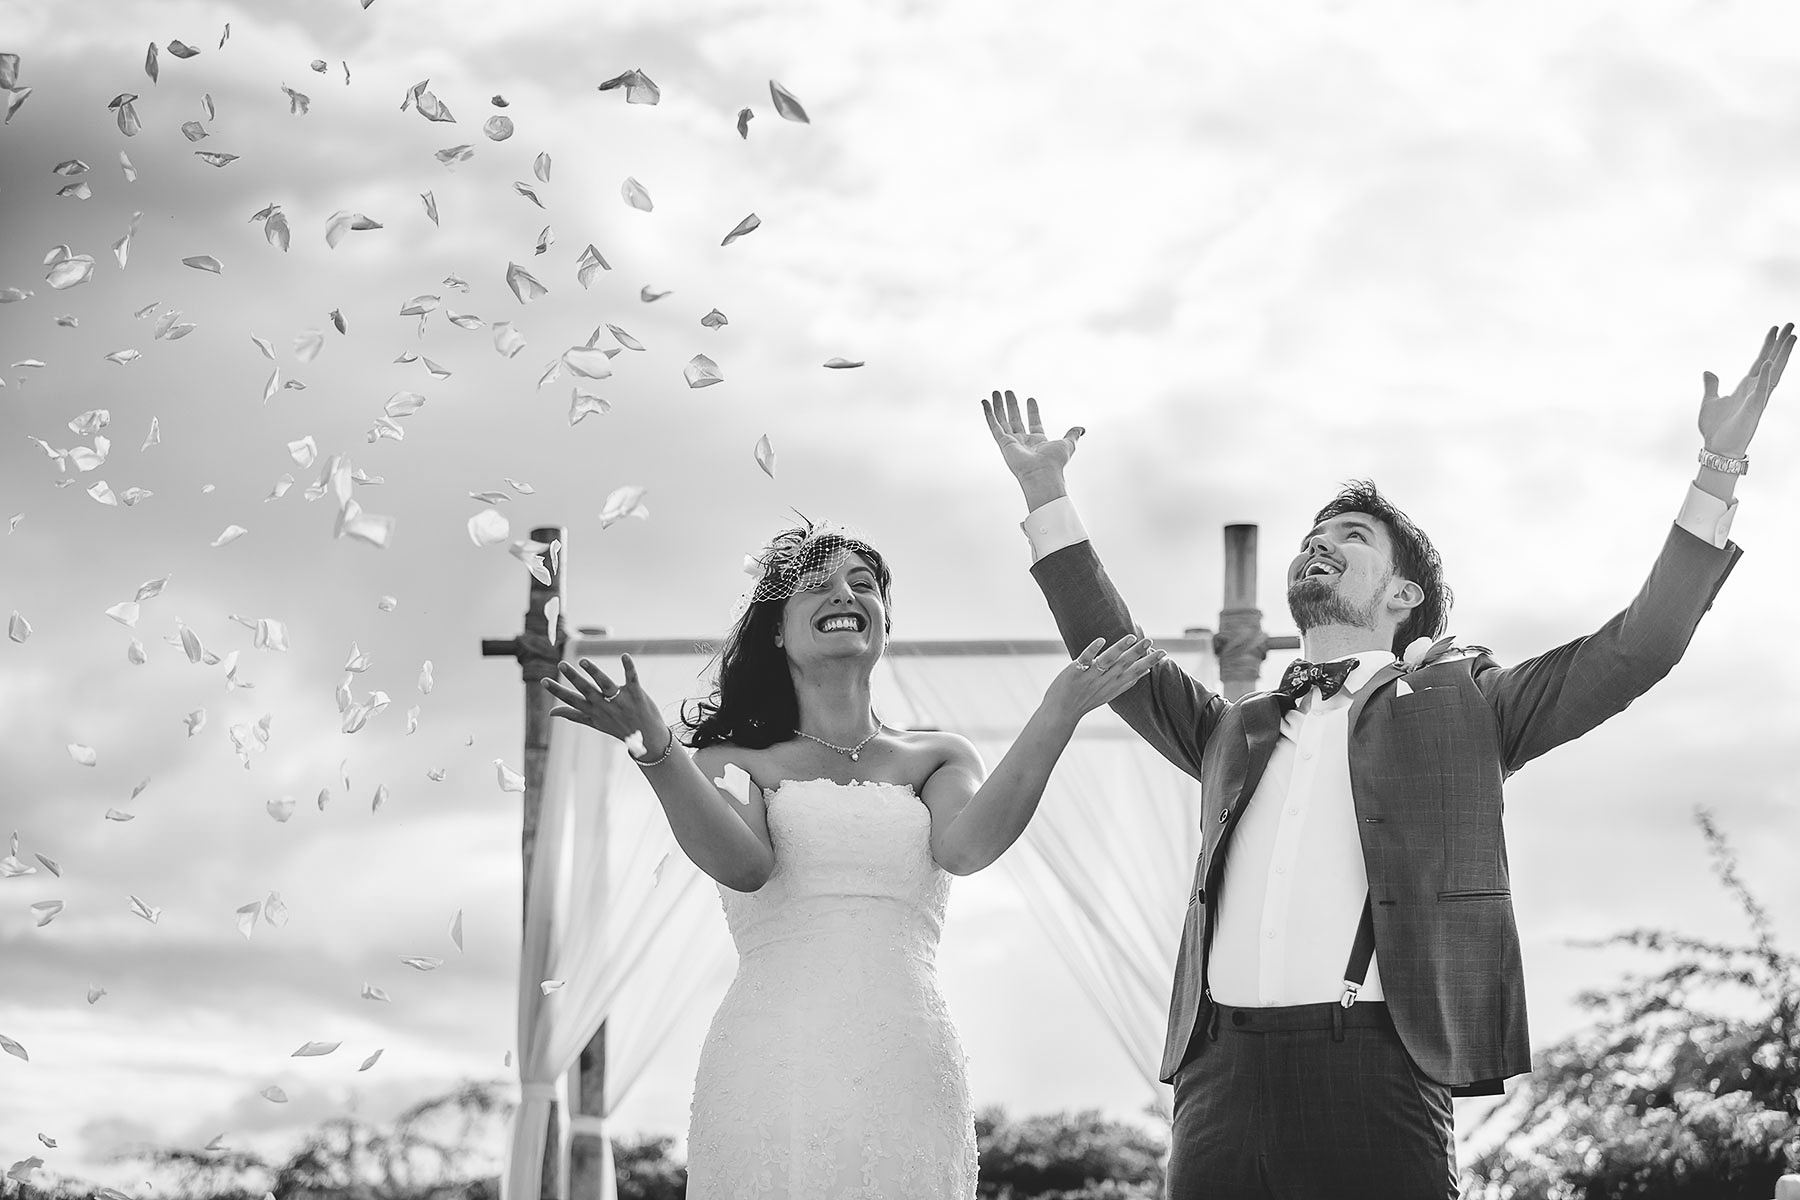 south-florida-wedding-photographer-tiny-house-photo-31.jpg